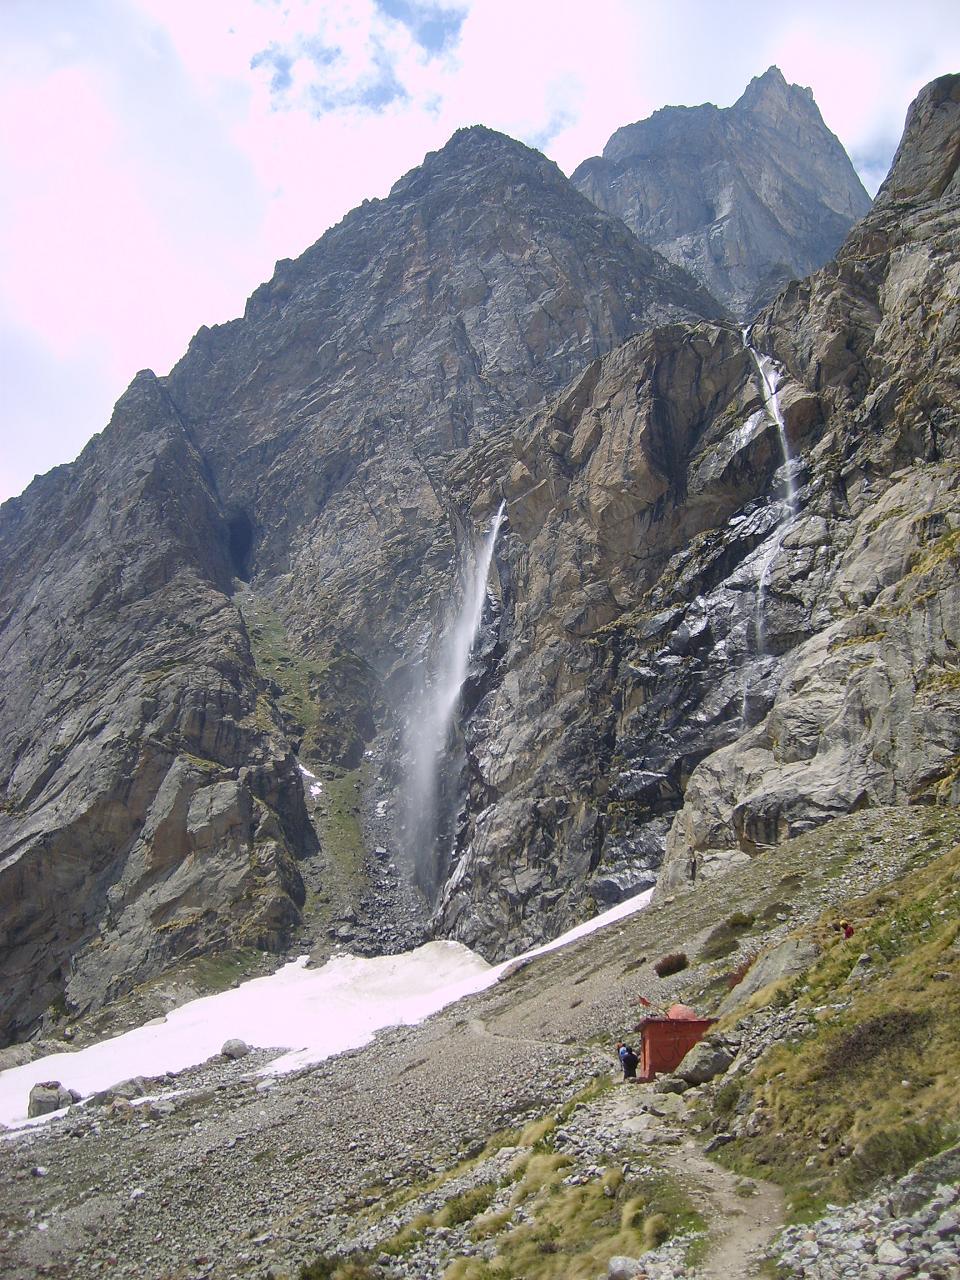 वसुधारा (साभार: http://scriptures.ru/india/uttarakhand/badrinath/mana_en.htm)